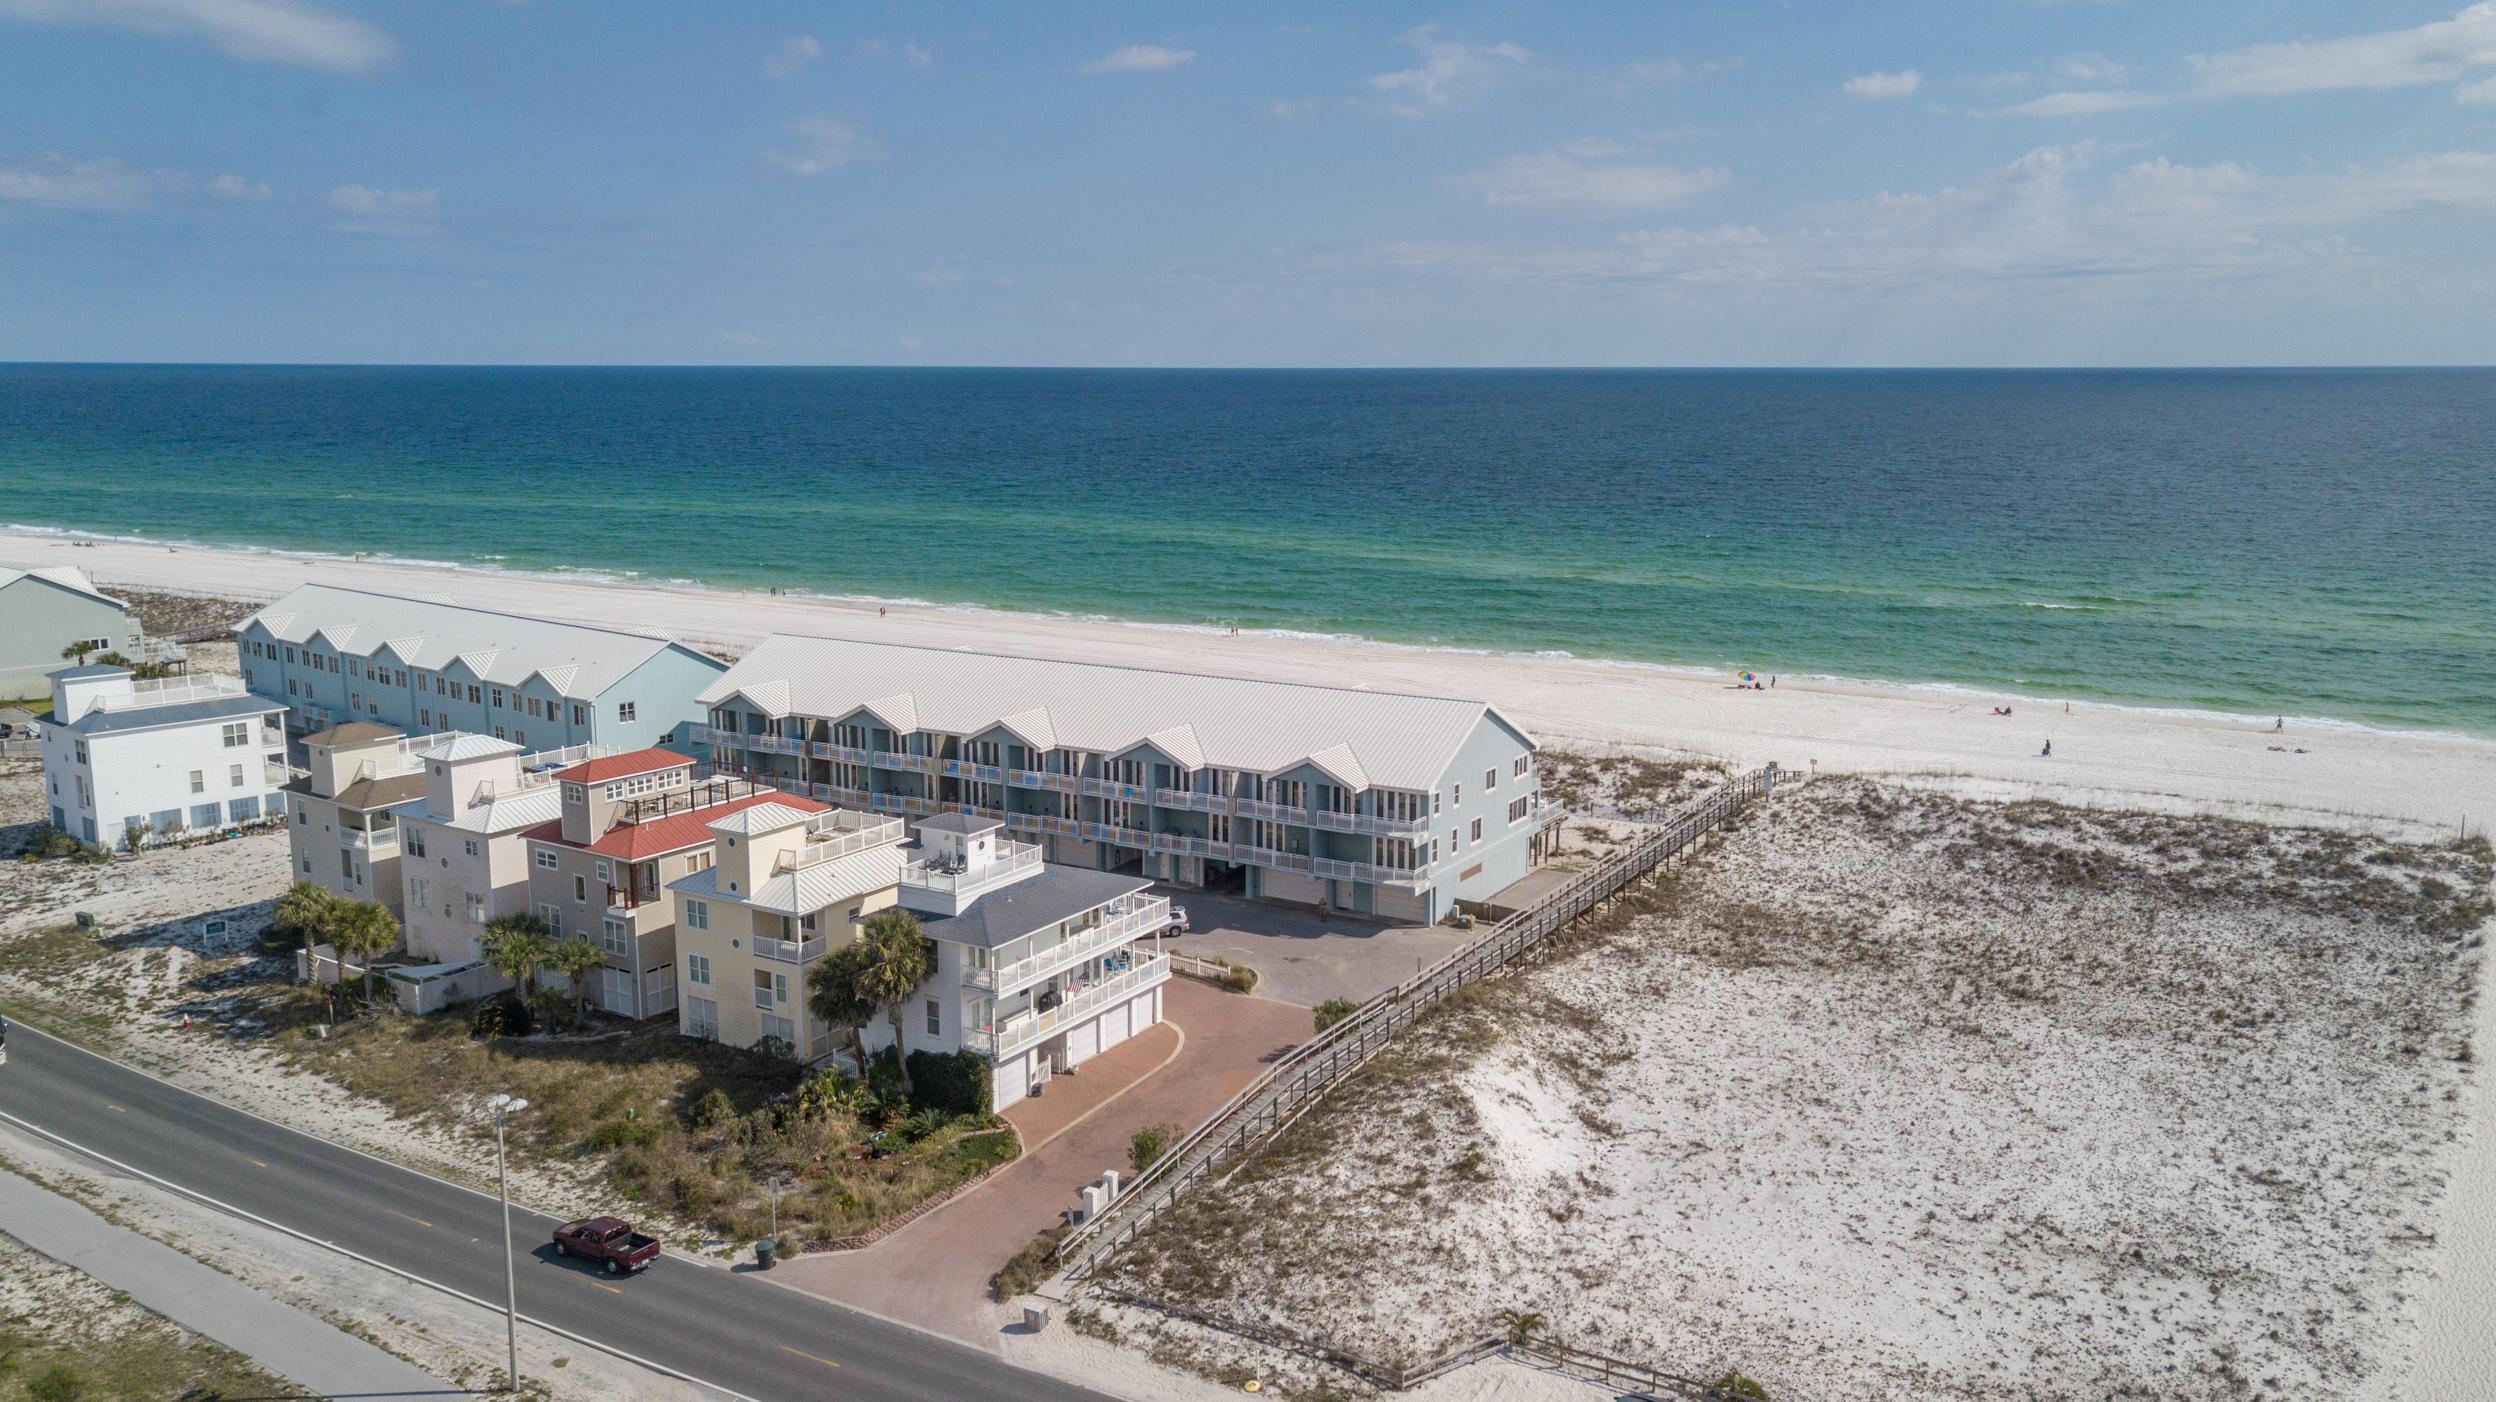 White Sands Cottage 501 Life's a Beach House Townhouse rental in White Sands Pensacola Beach in Pensacola Beach Florida - #53